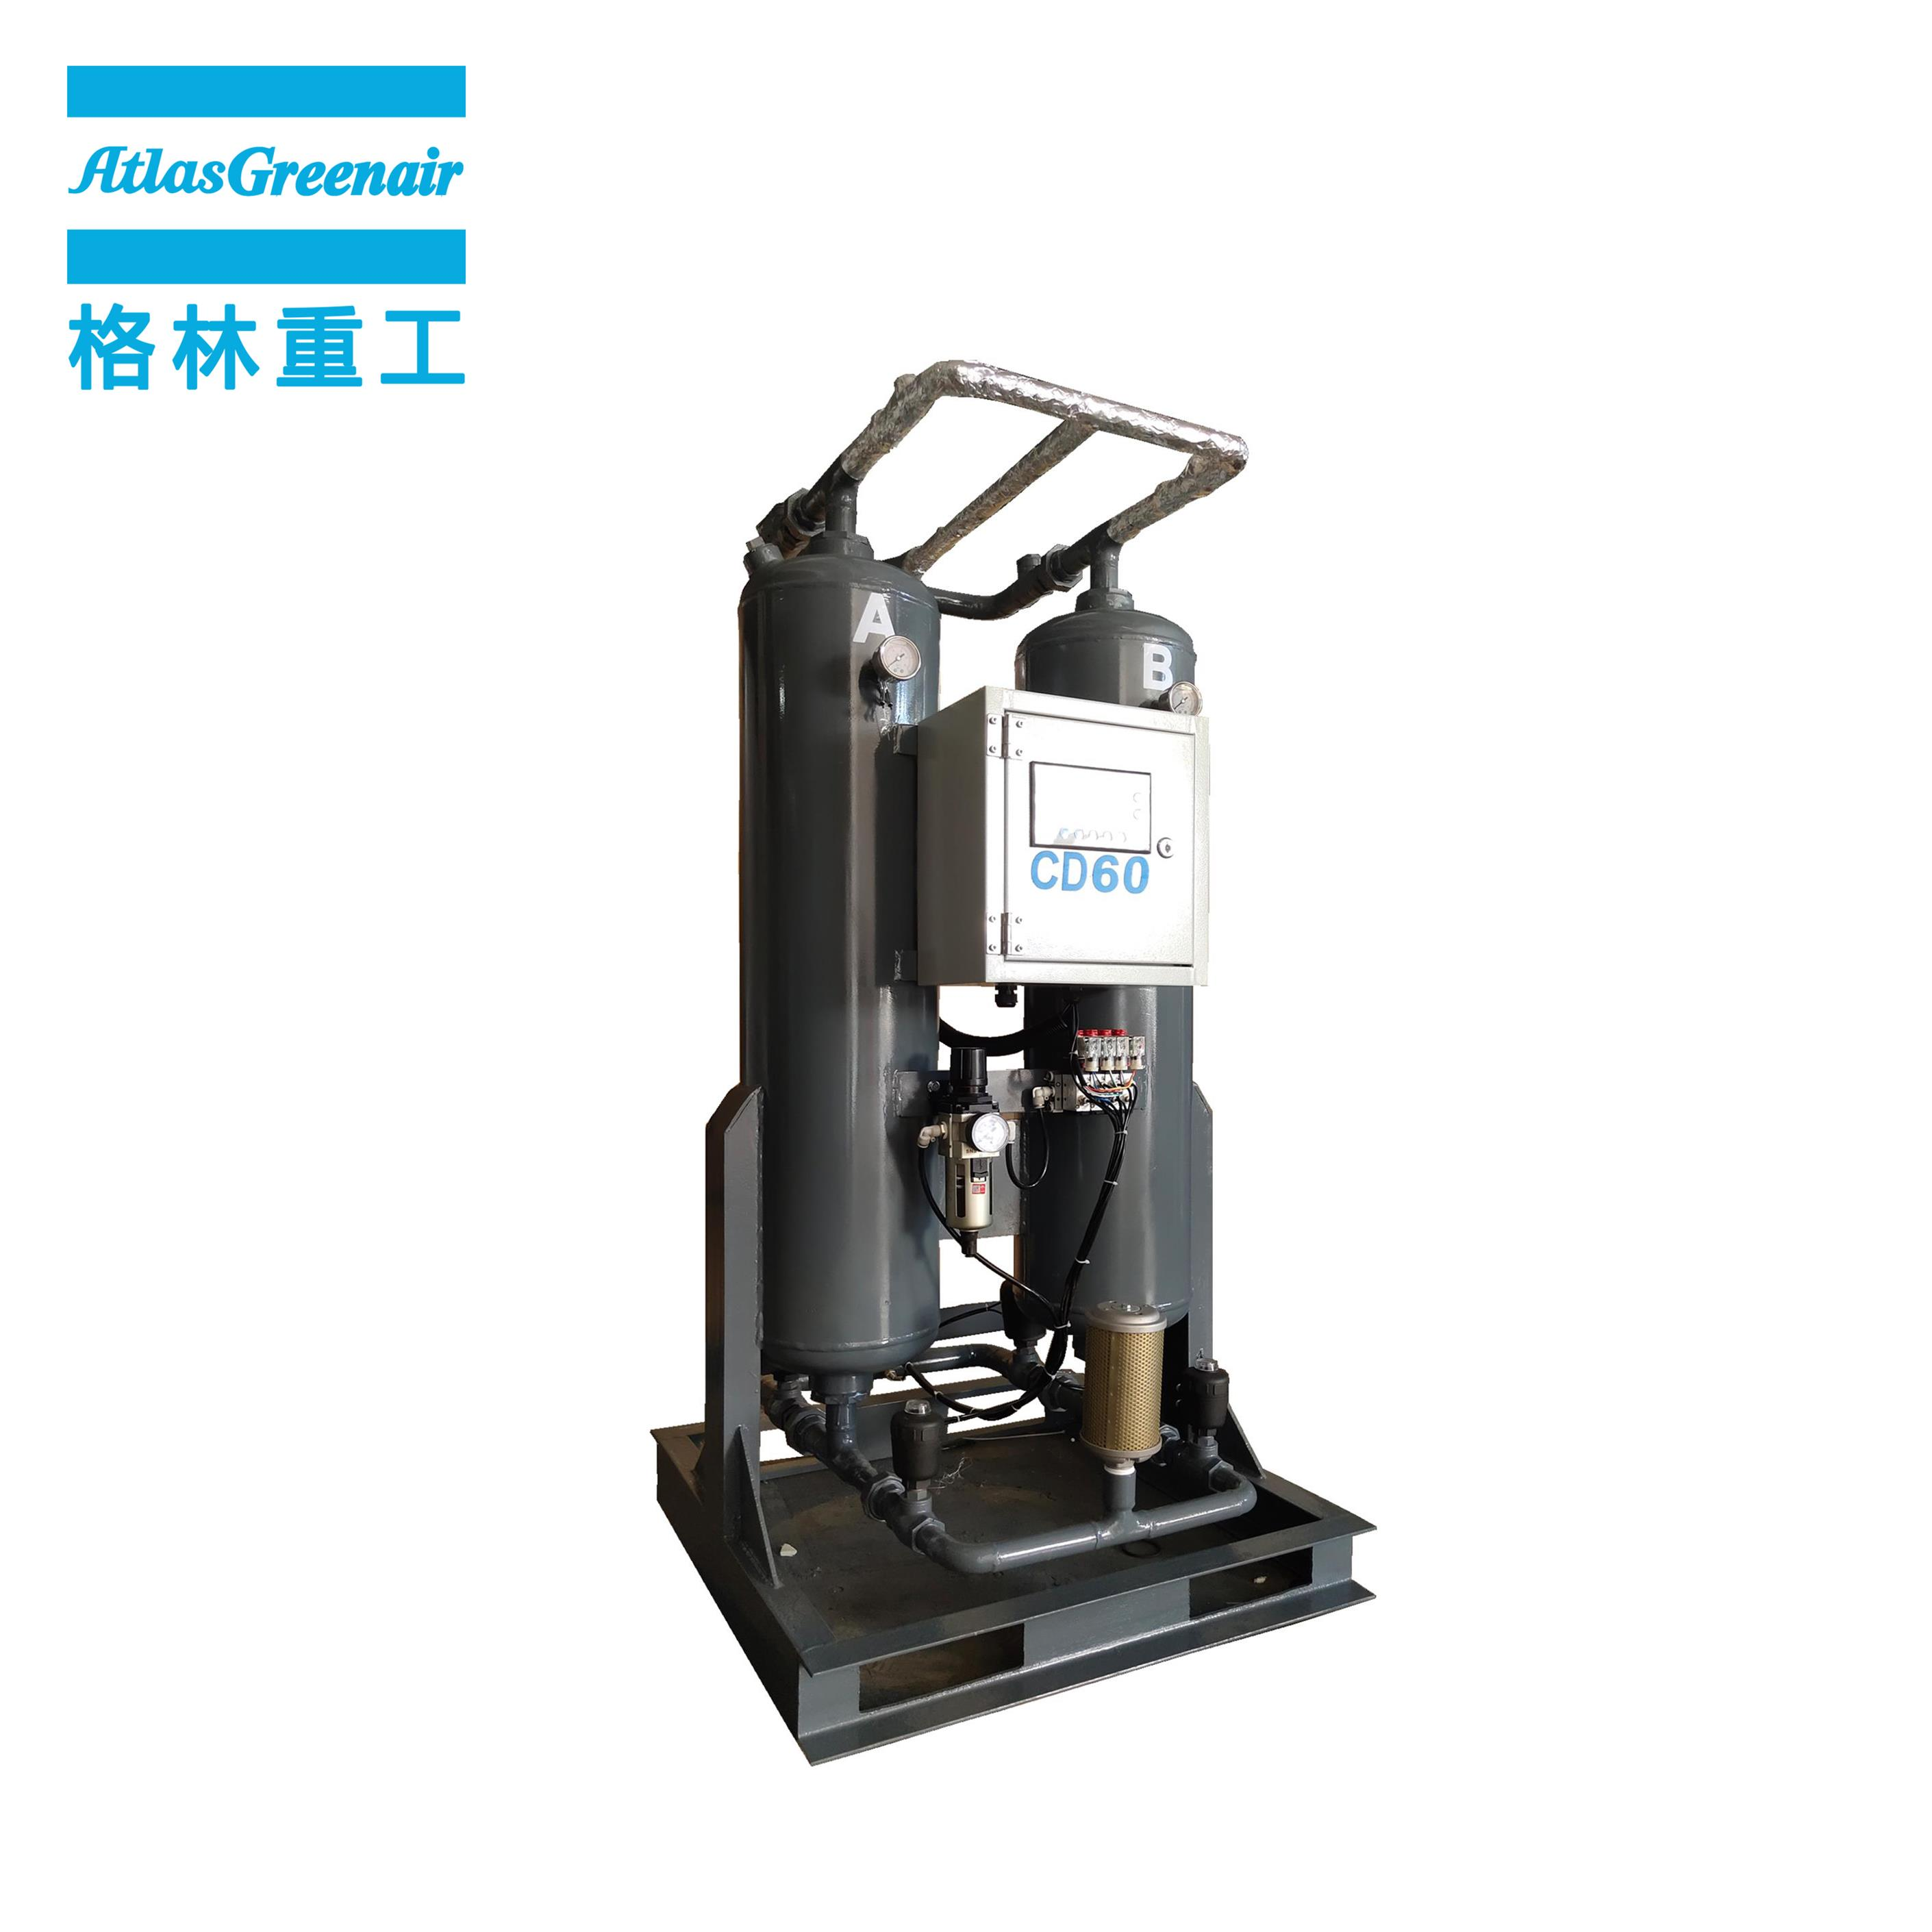 Atlas Greenair Screw Air Compressor desiccant dryer for busniess for a high precision operation-2